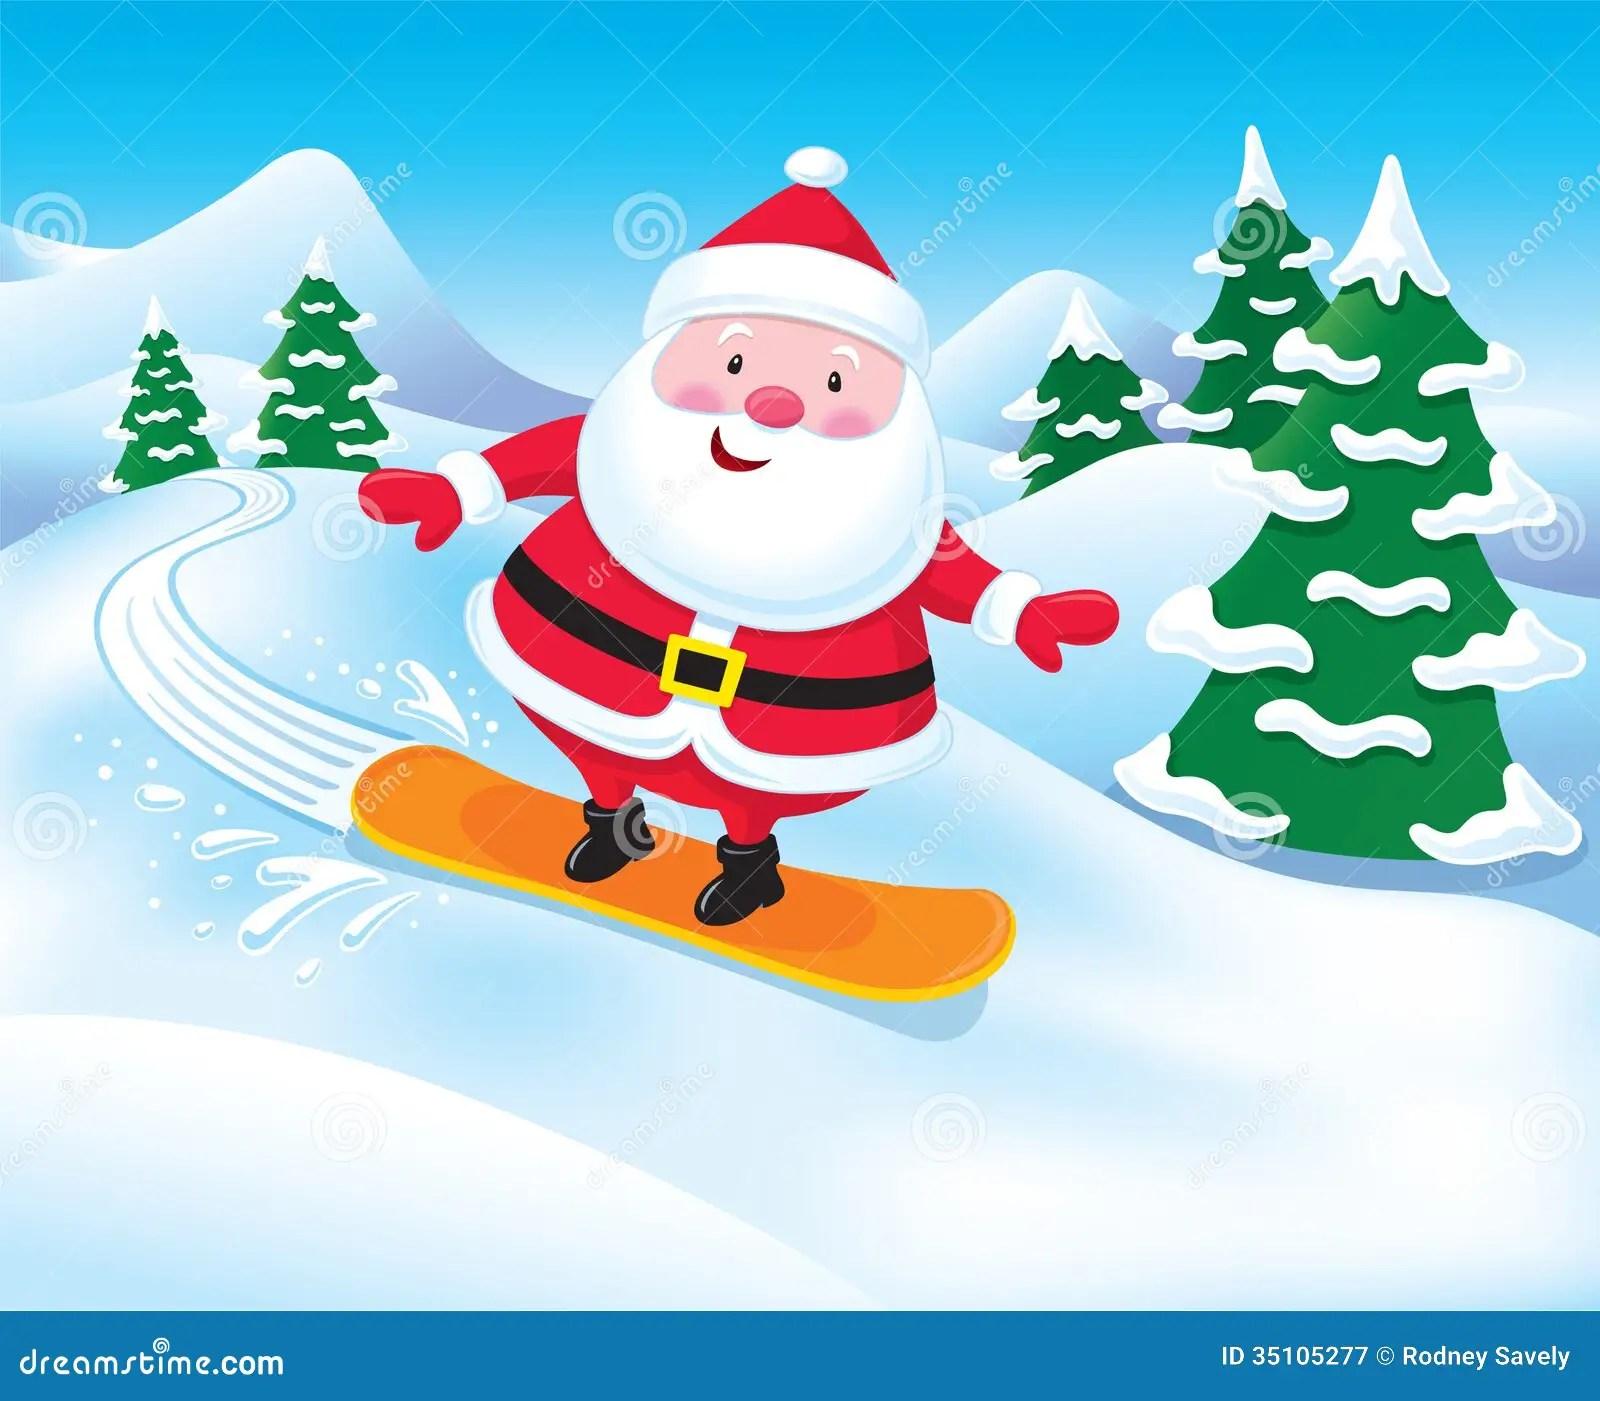 Snowboarding Santa Claus Royalty Free Stock Photography